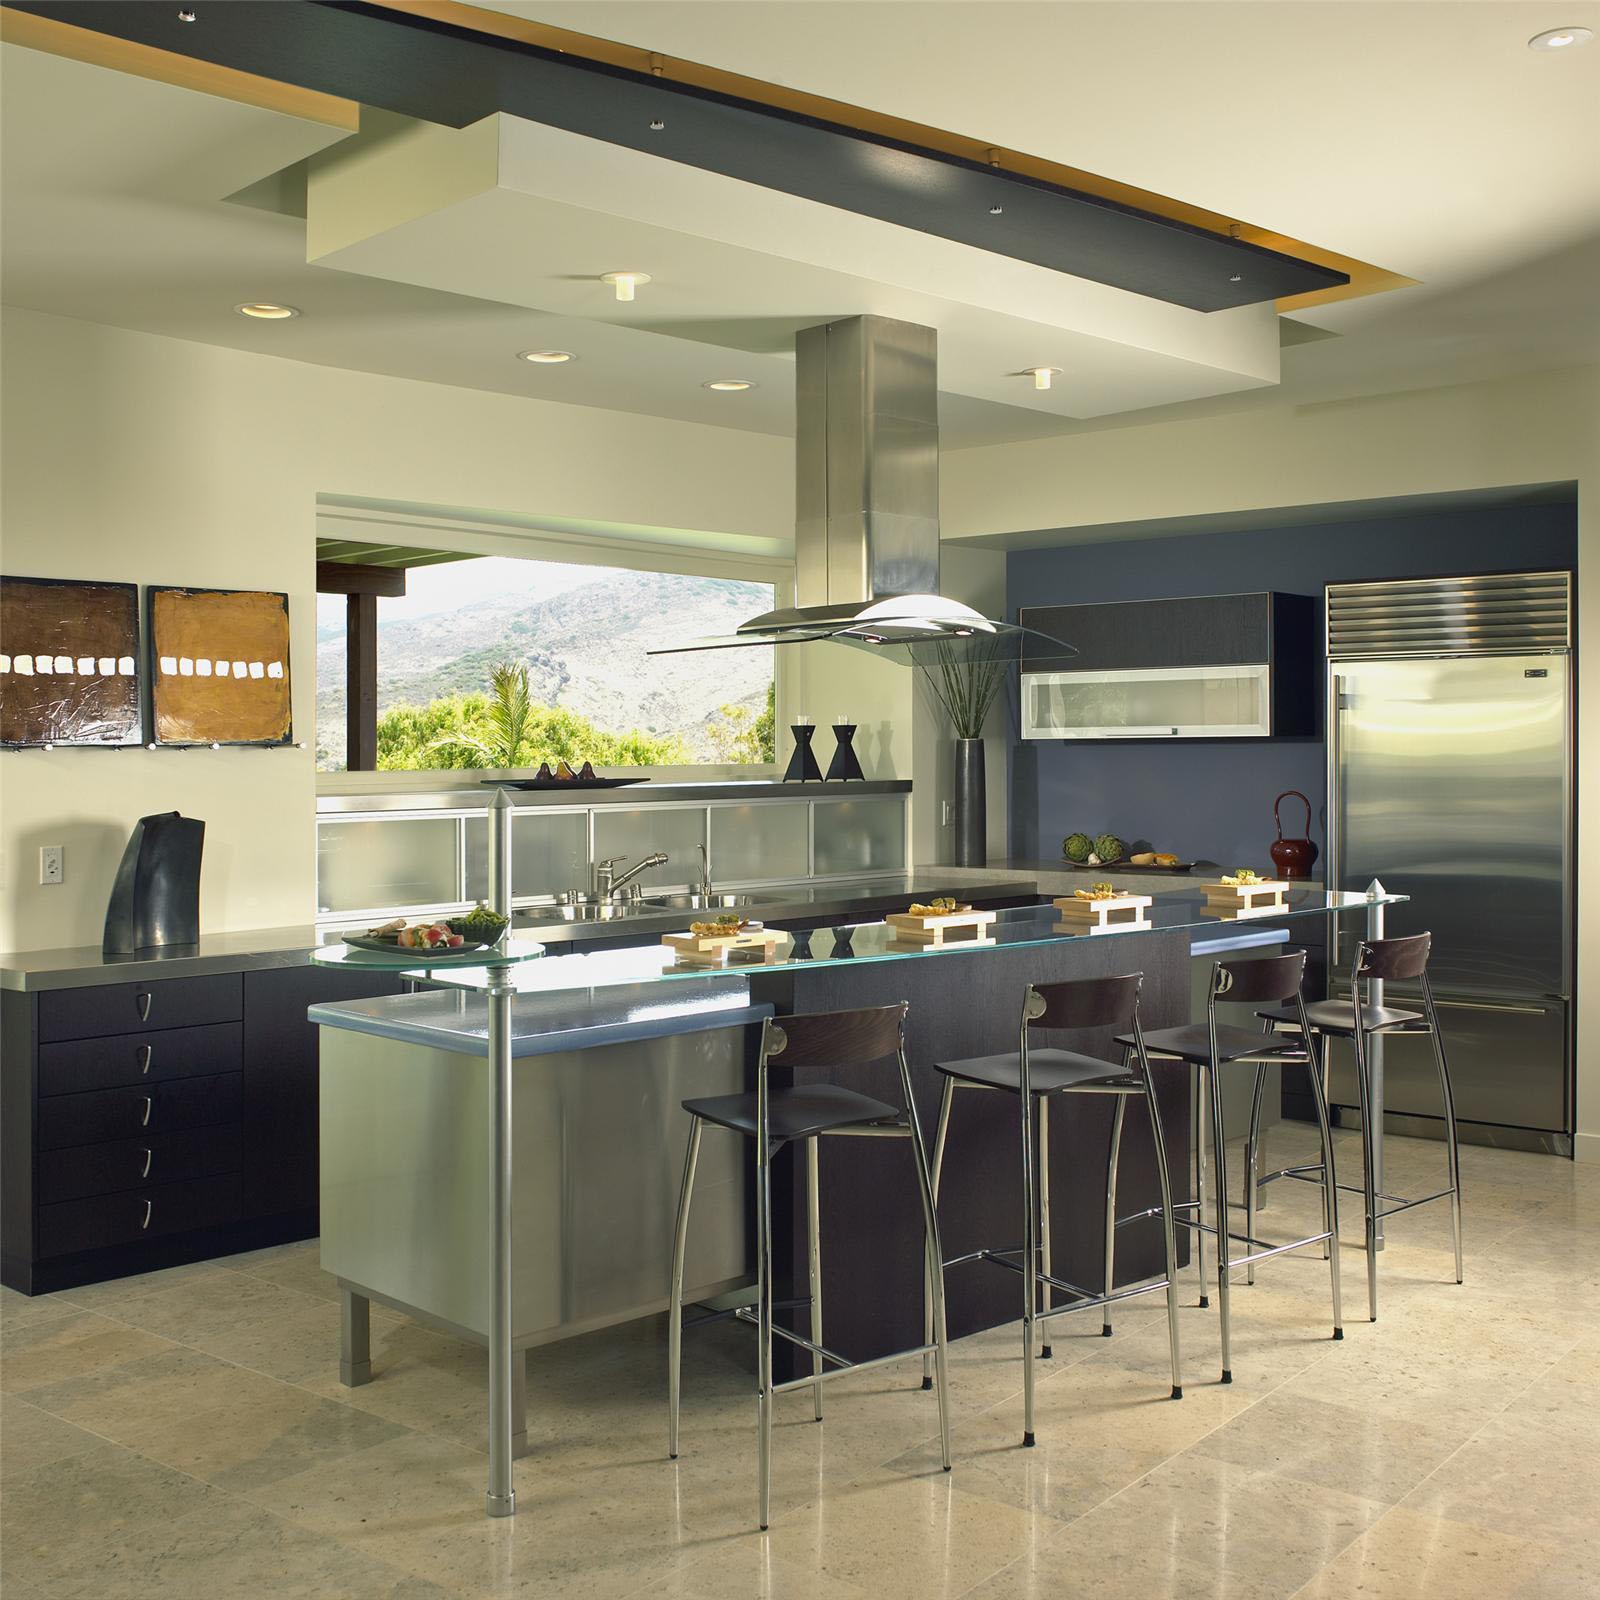 Great Modern Kitchen Design For Small Space Modern: Tips Dalam Mendesain Dapur Terbuka Minimalis